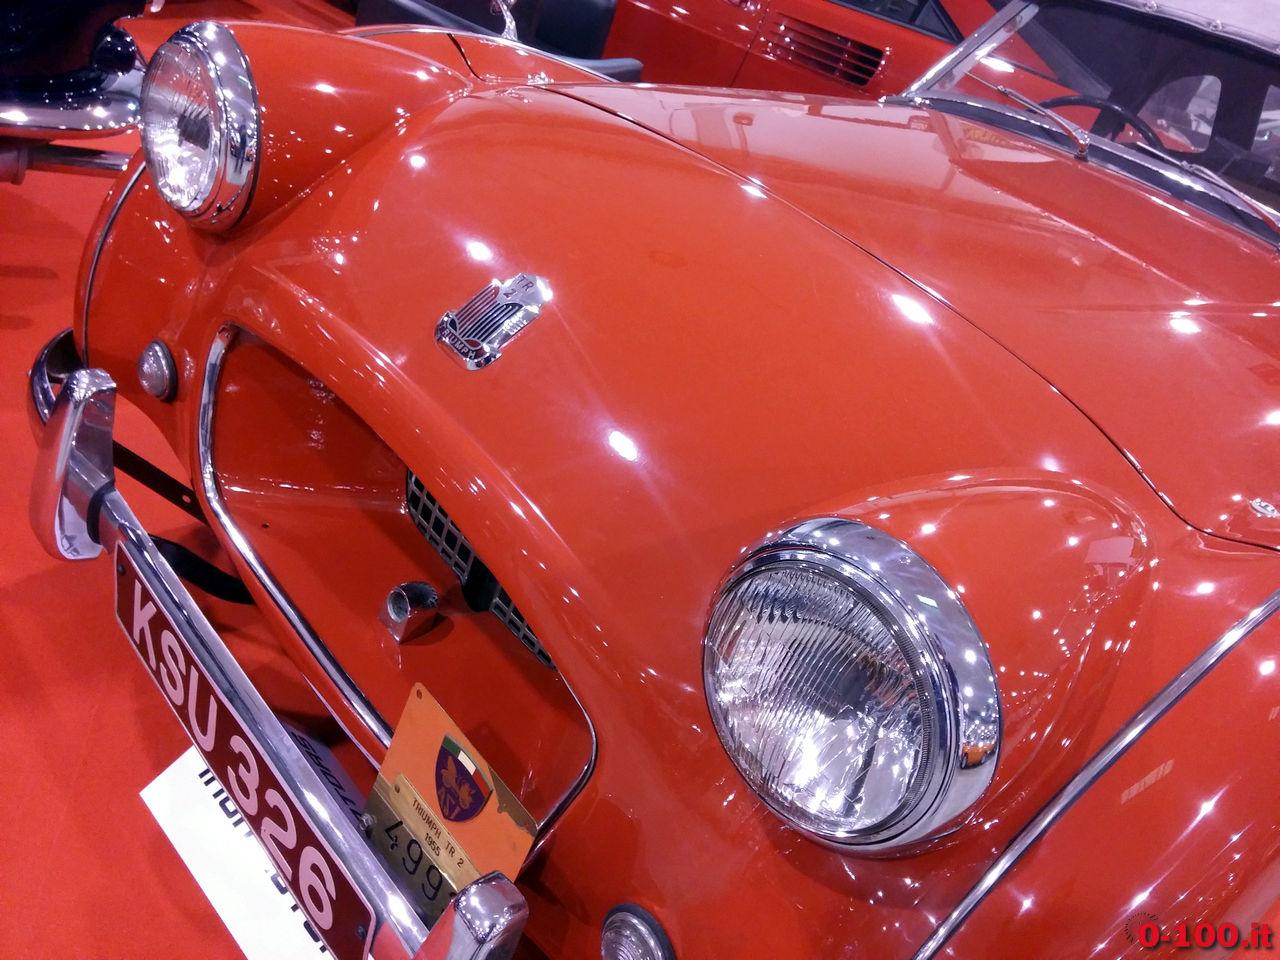 automotodepoca-2016-car-market-mercato-auto-prezzo-price_0-10068